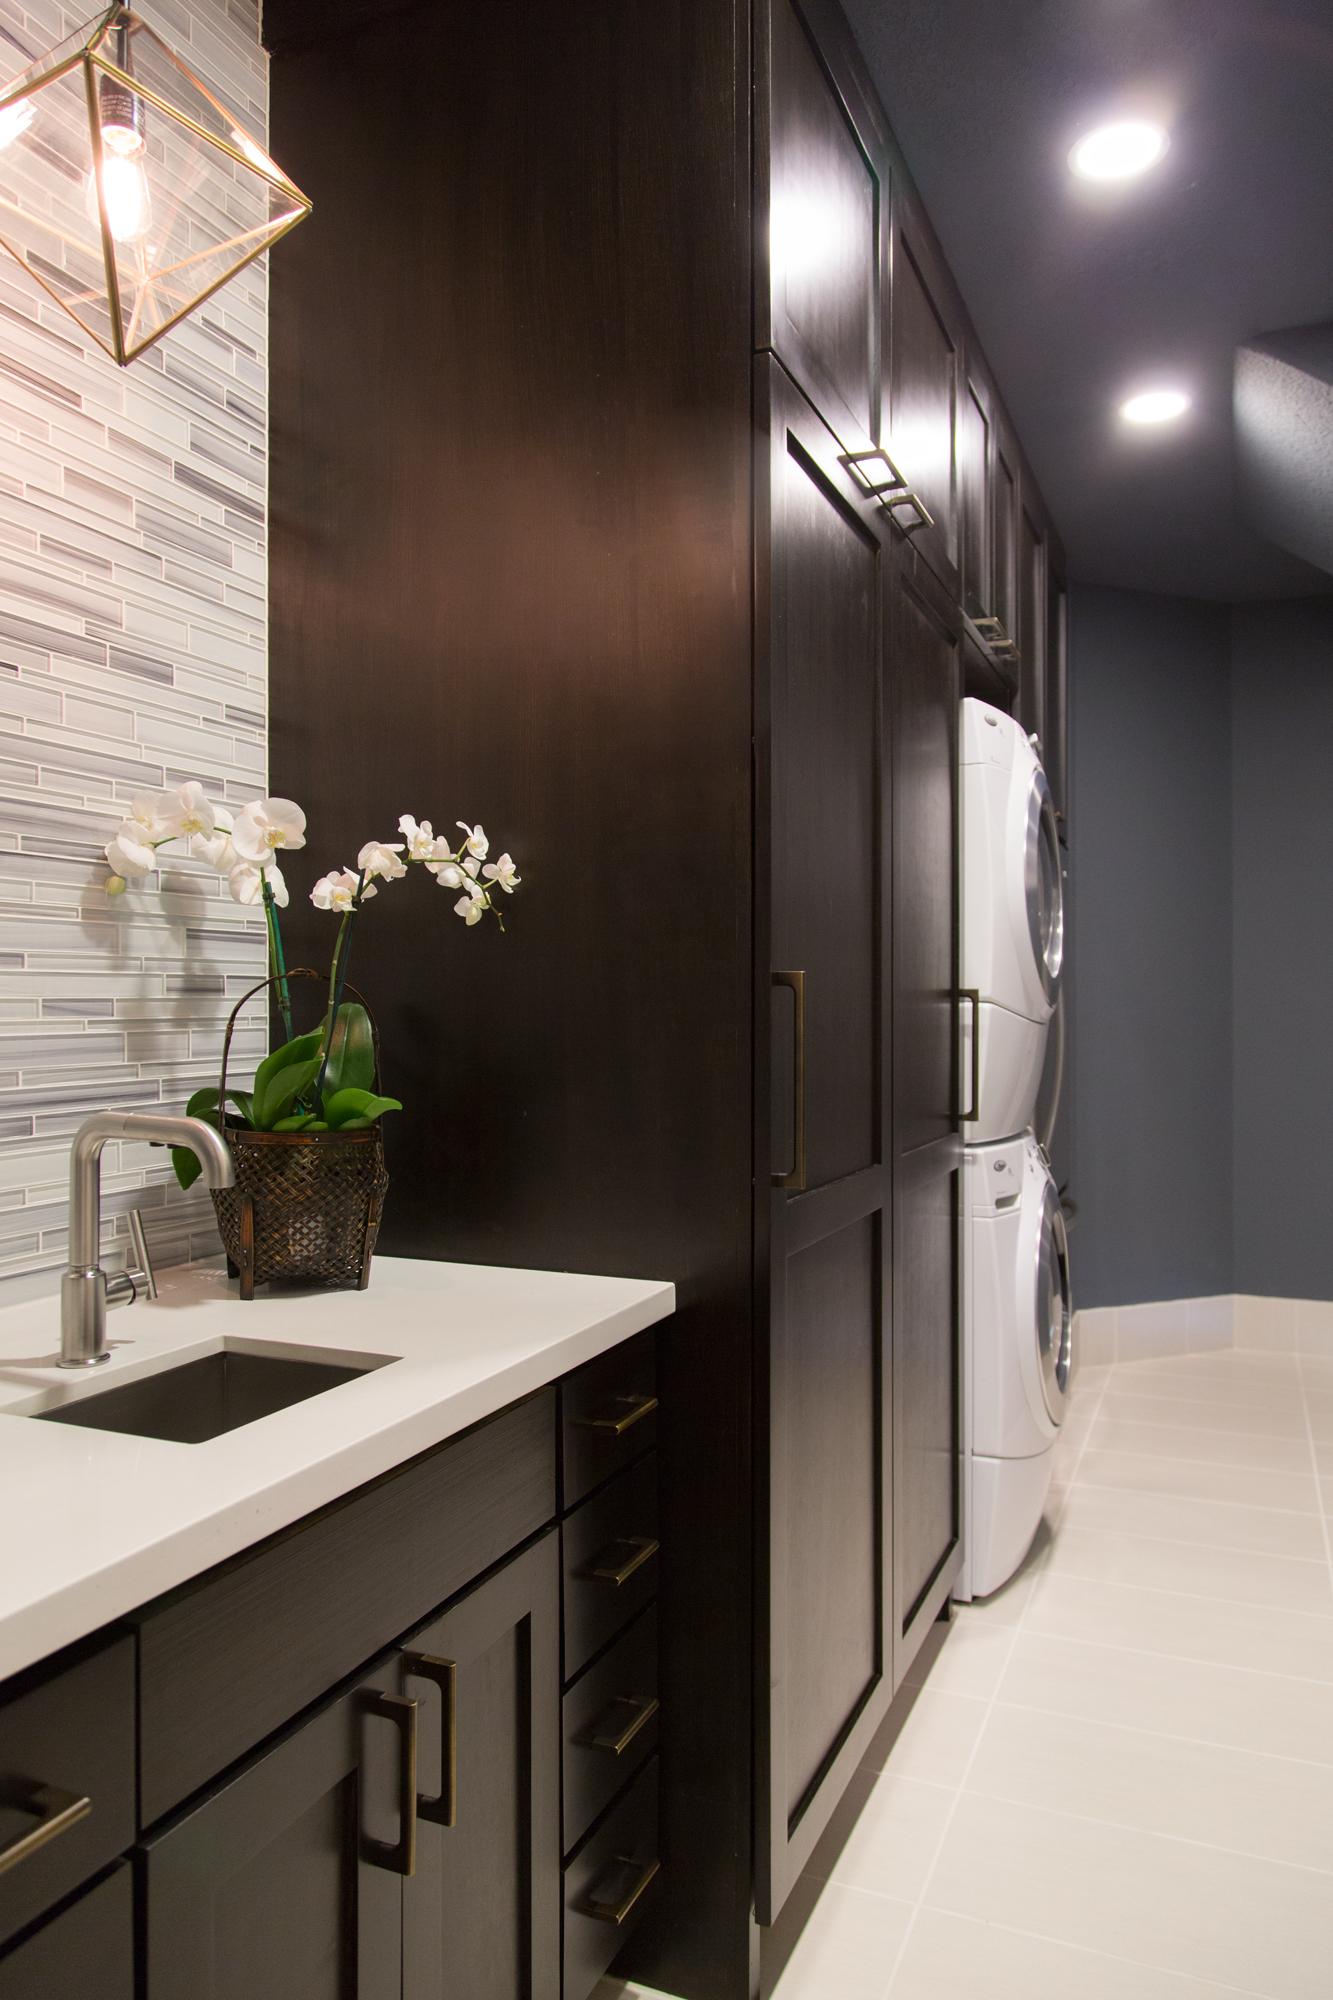 Laundry room remodel; sink; countertop; storage; cabinetry | Interior Designer: Carla Aston / Photographer: Tori Aston